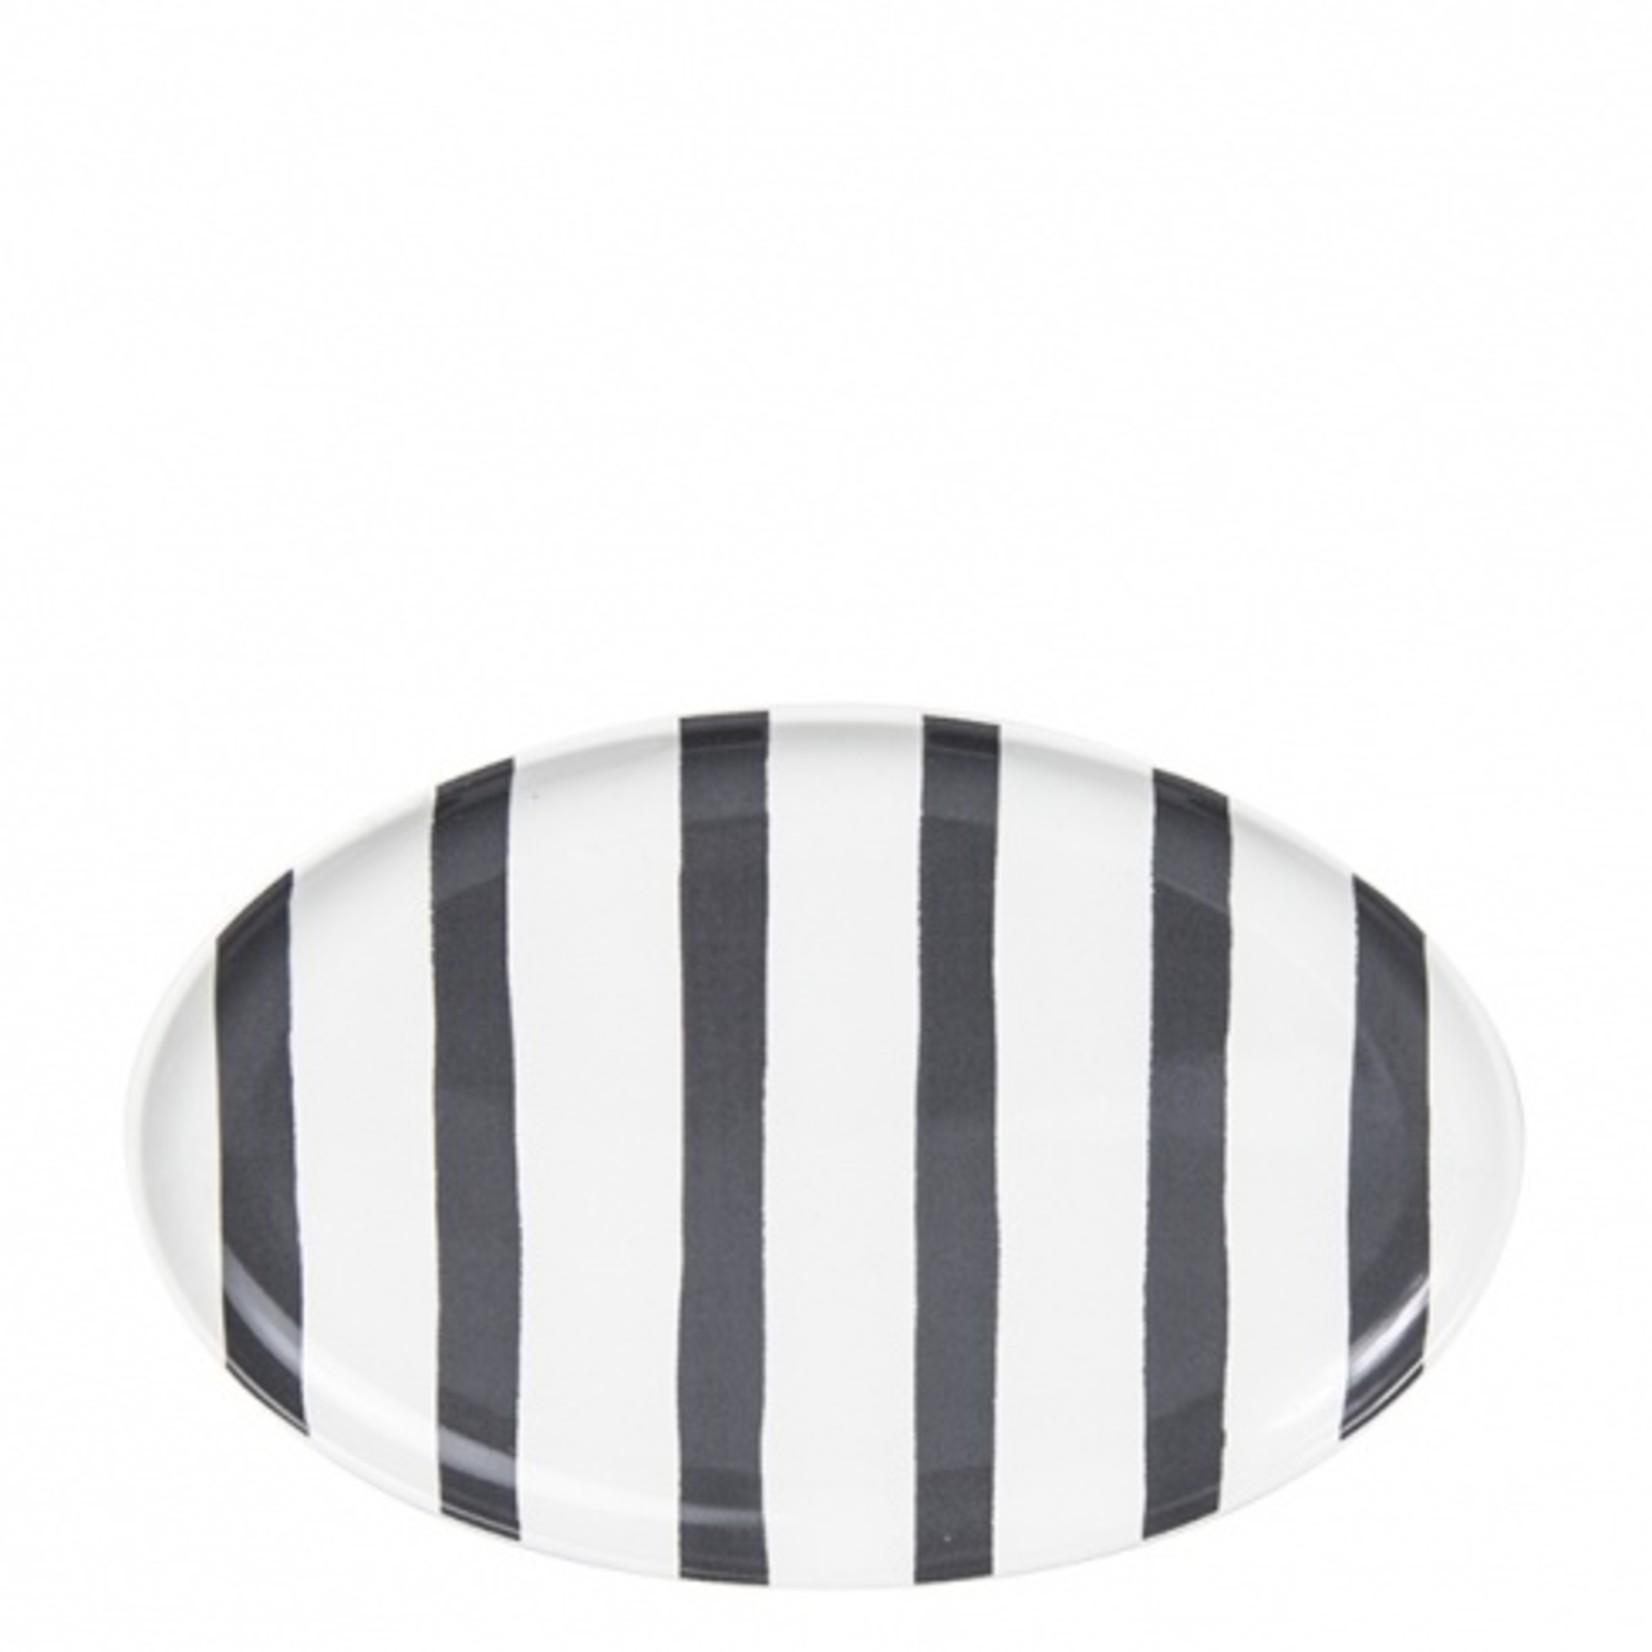 Bastion Collections ovaler Teller Stripes